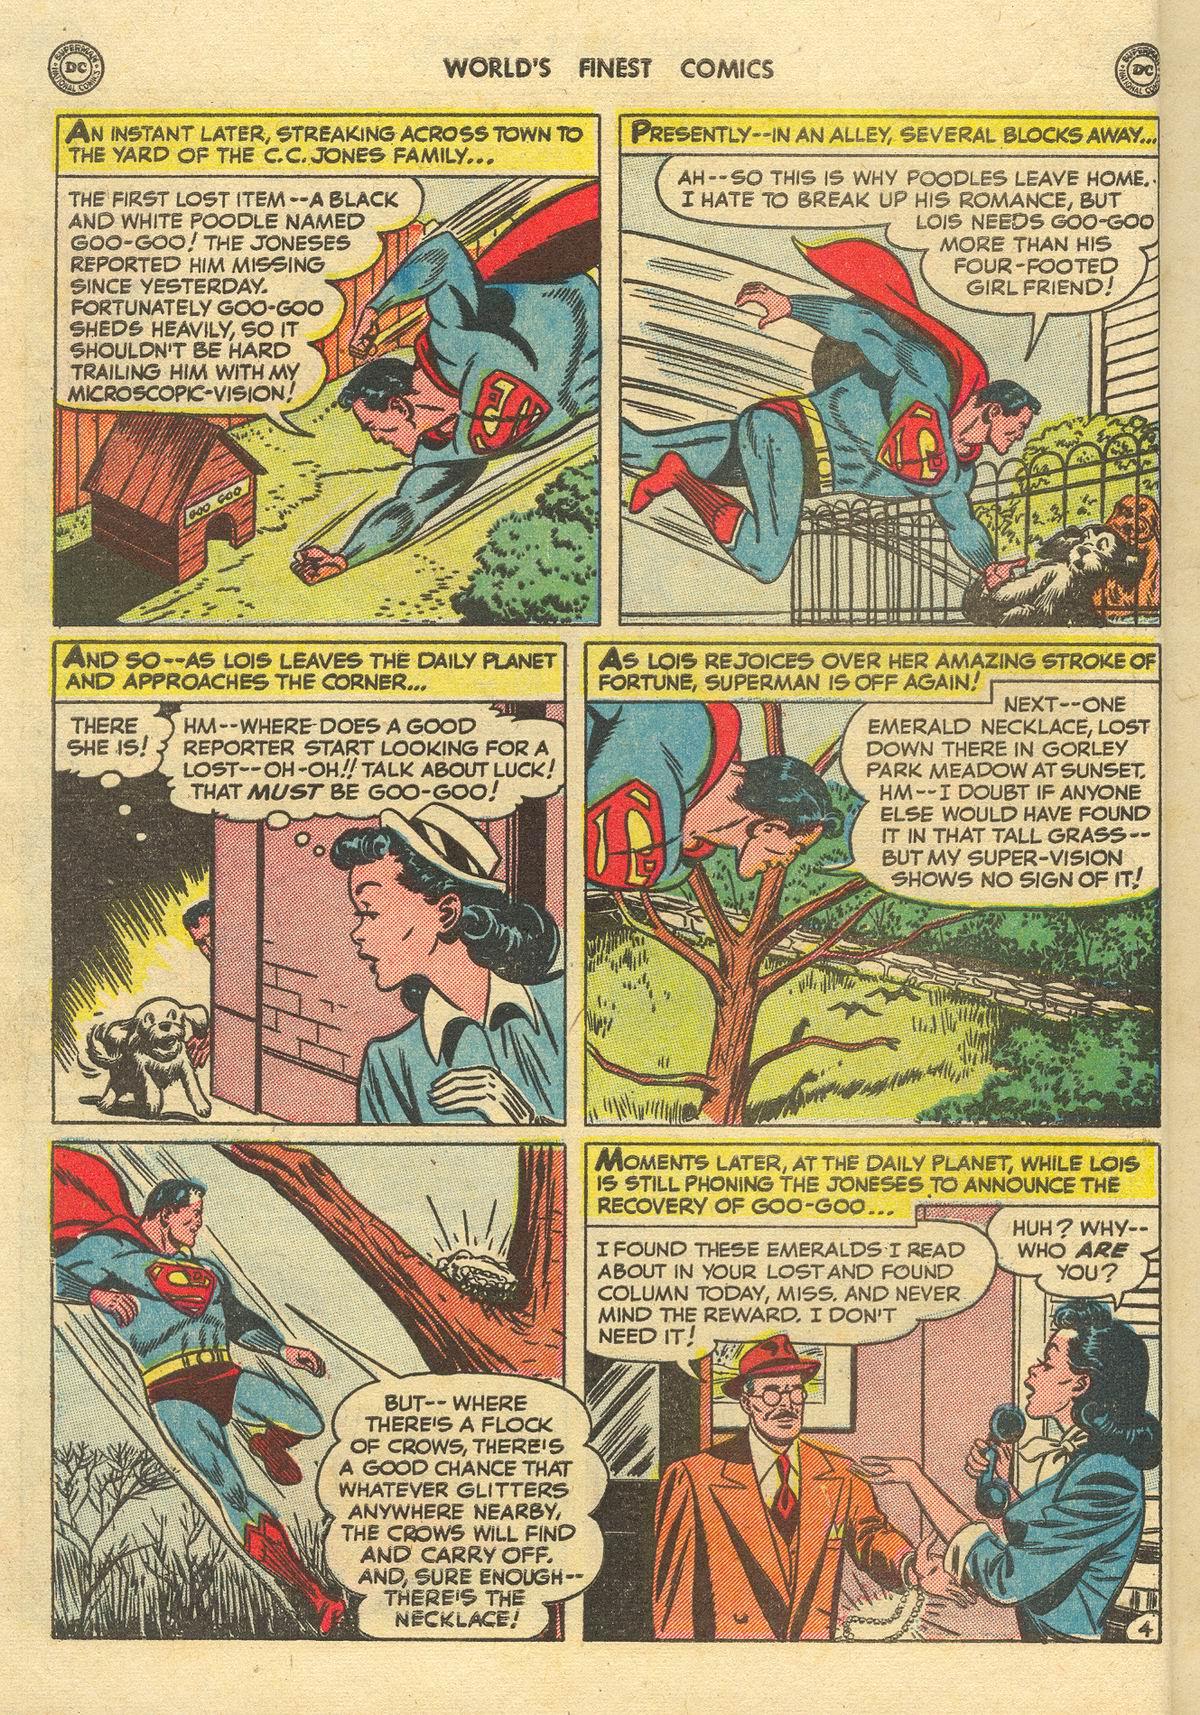 Read online World's Finest Comics comic -  Issue #51 - 6